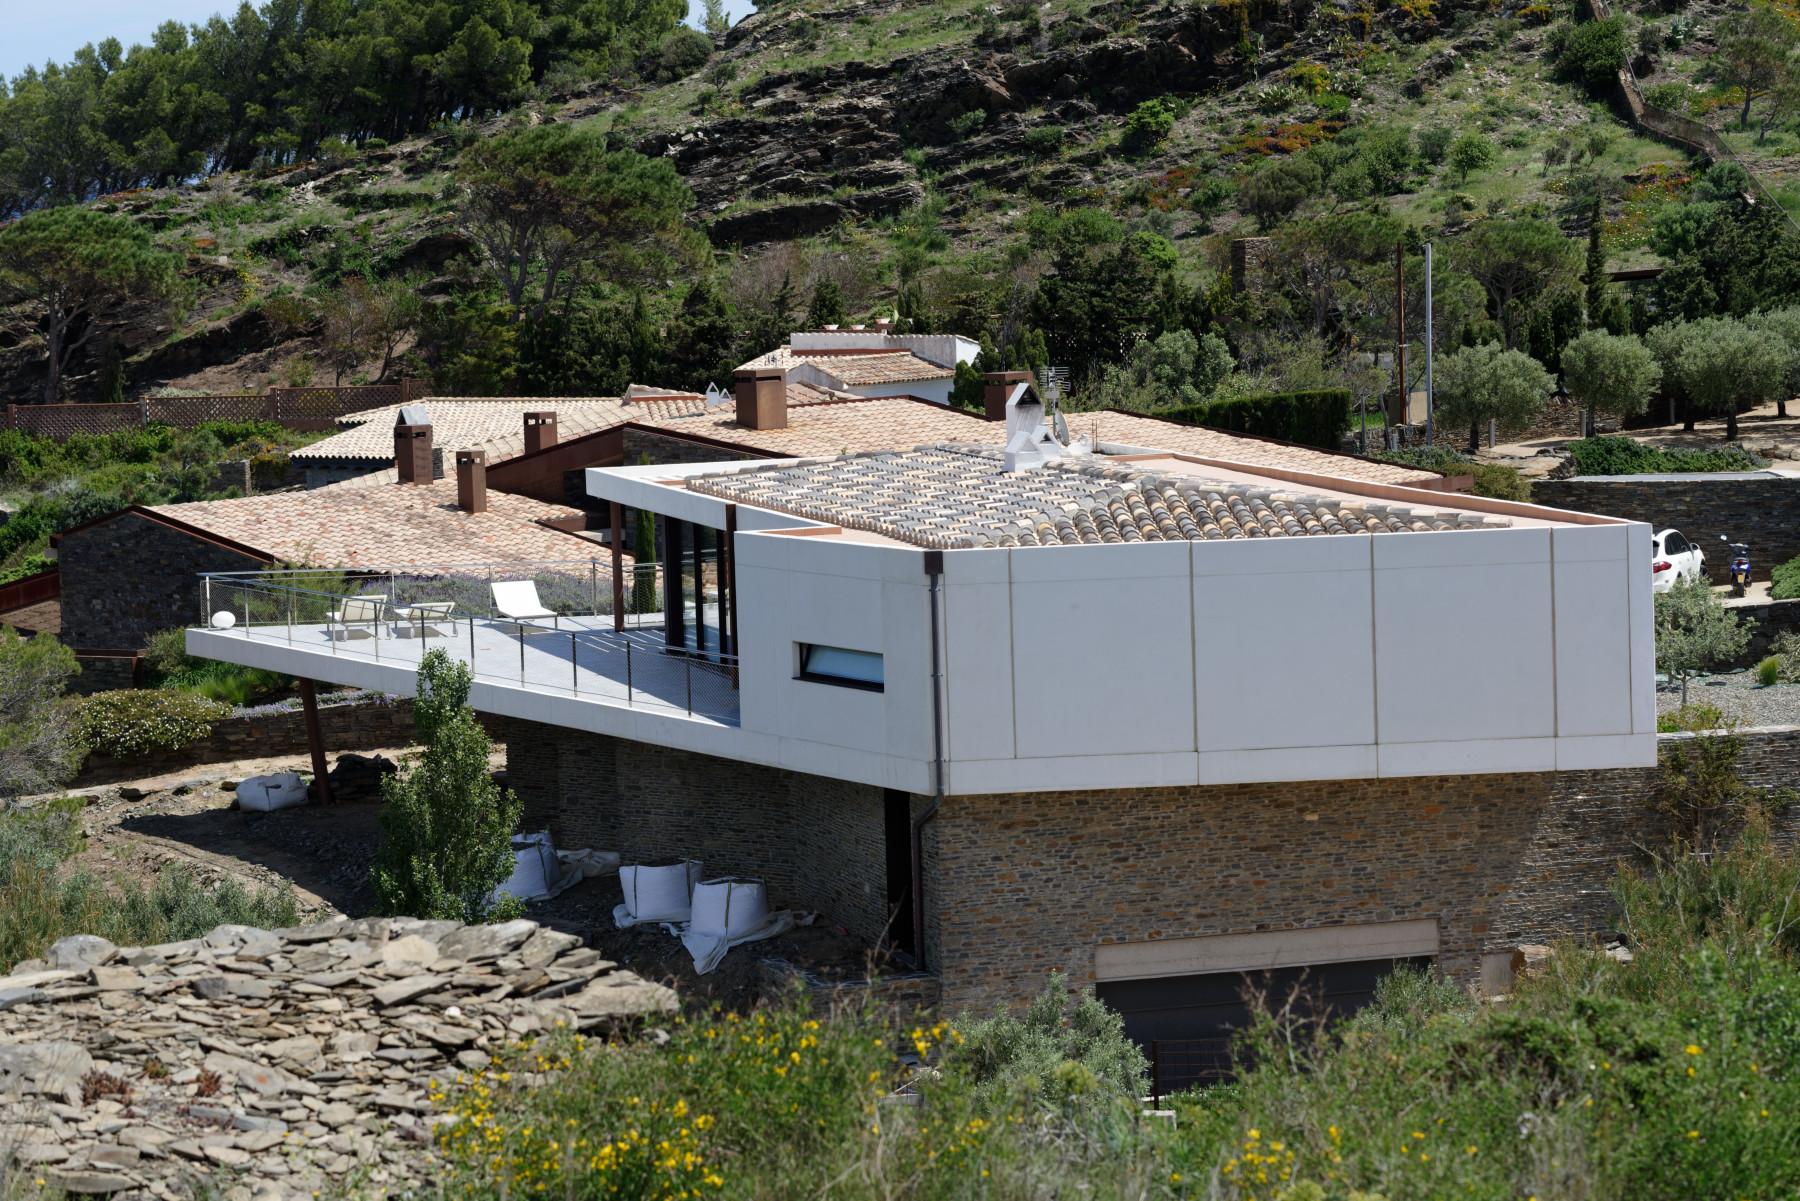 180430-2-Port lligat (20) (Catalogne)